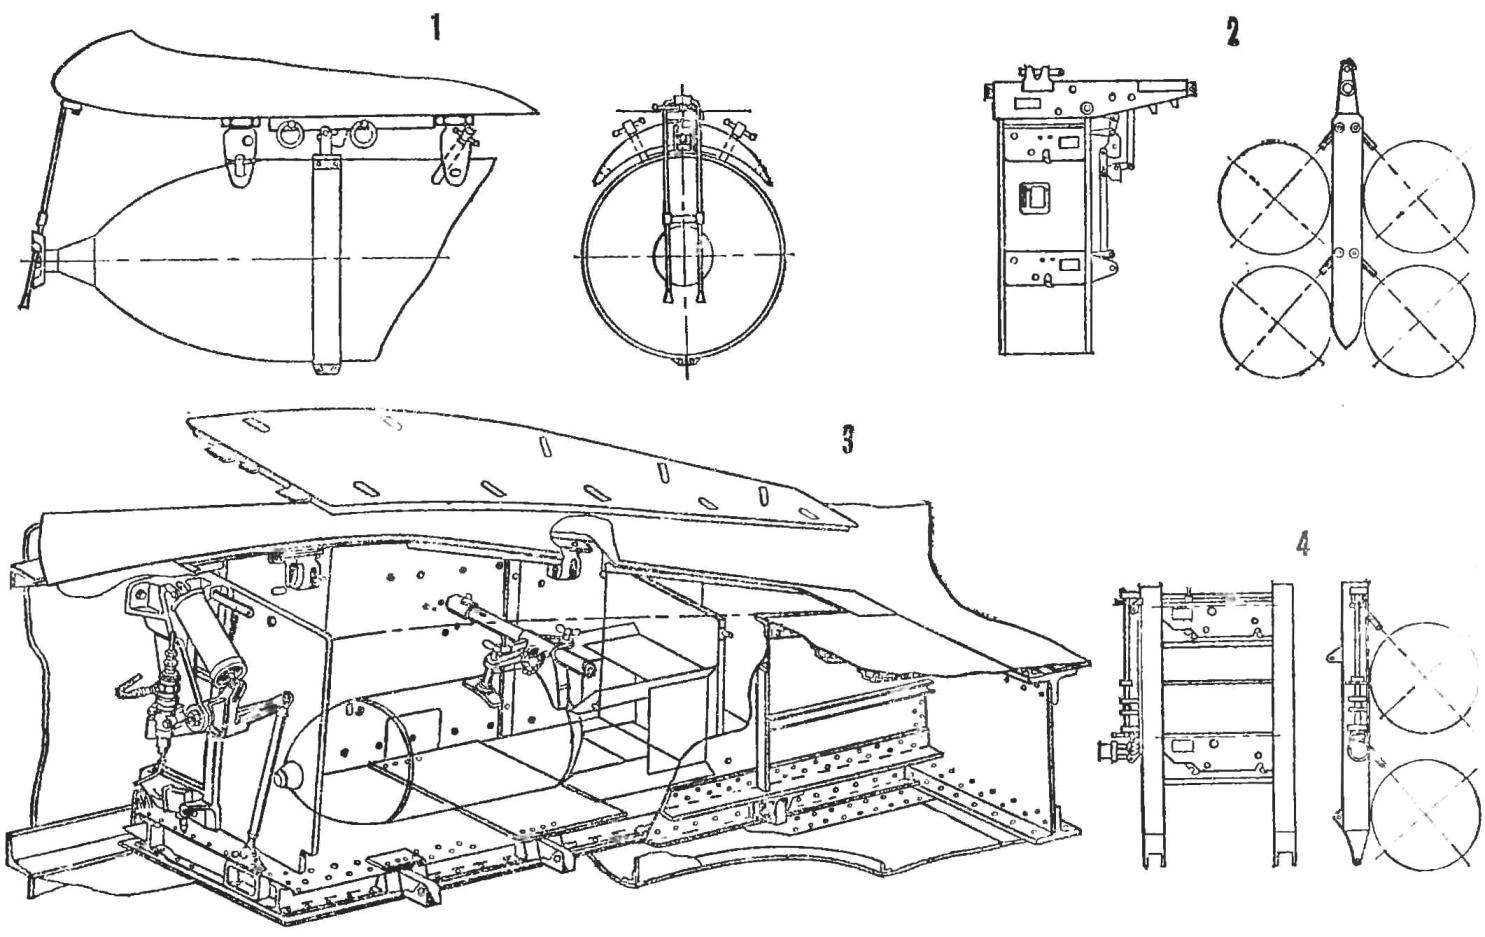 Fig. 1. Bomb racks